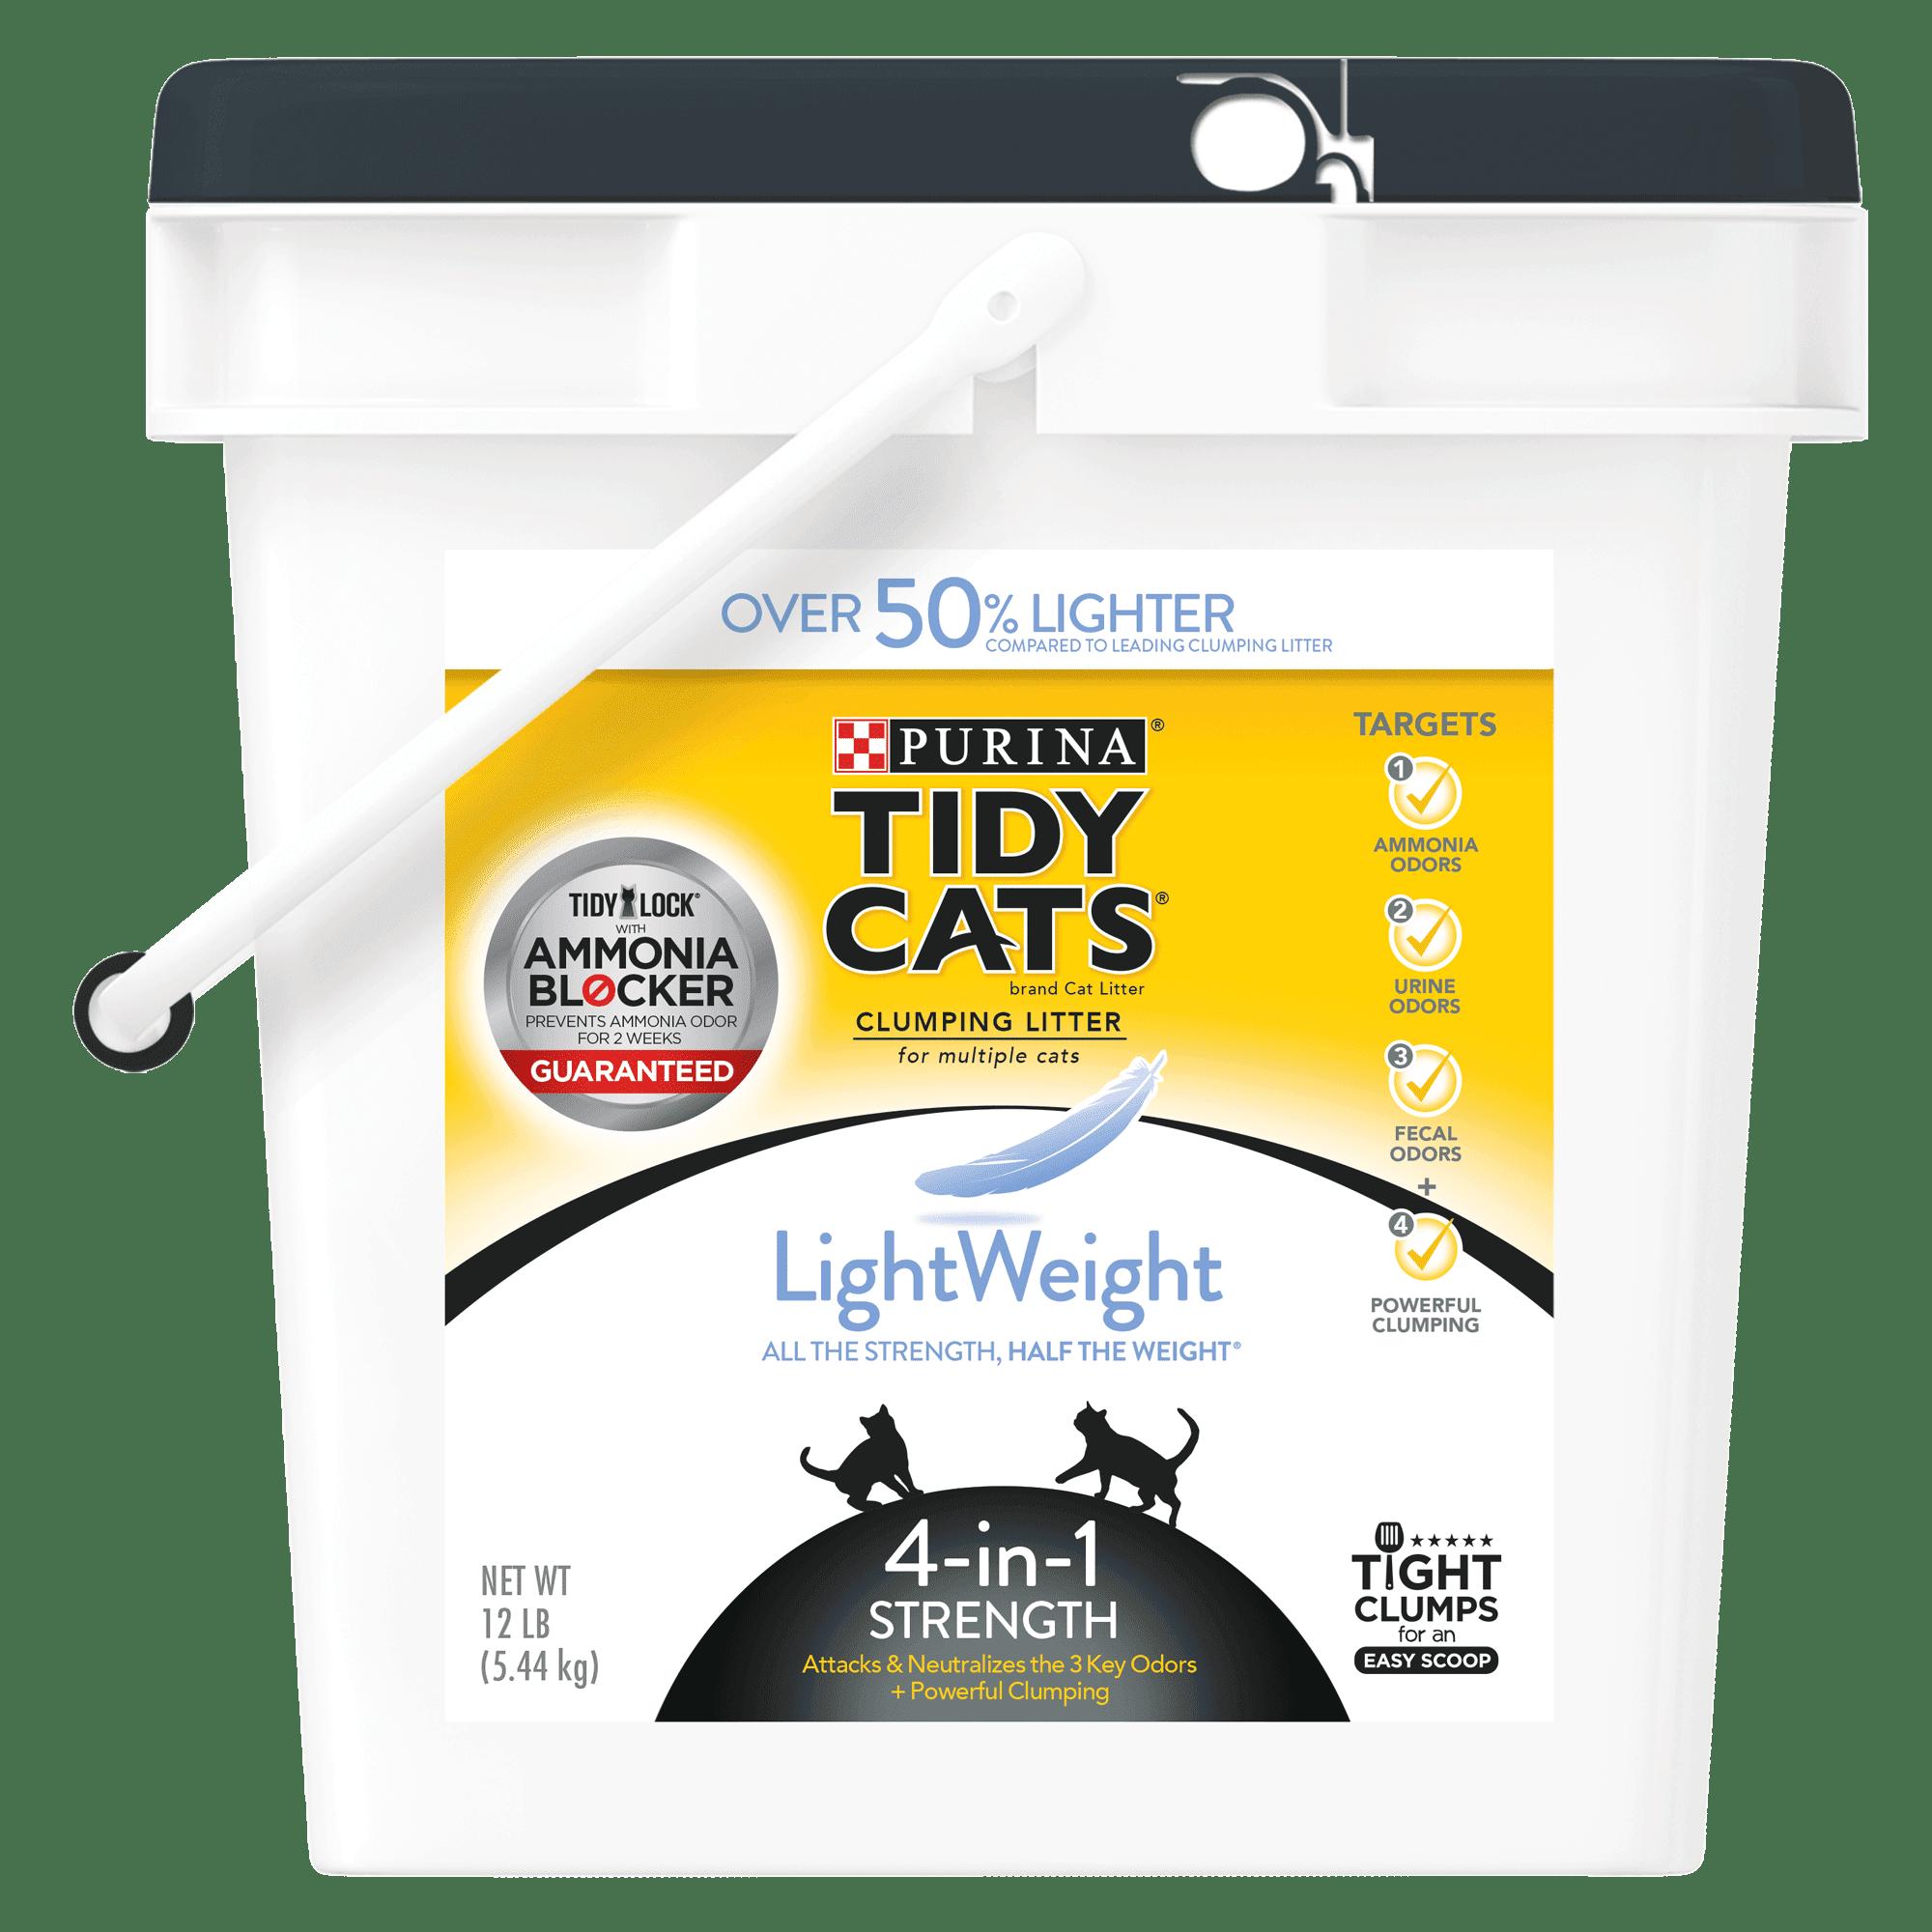 Purina Tidy Cats LightWeight 4-in-1 Strength Clumping Cat Litter, 12-lb Pail